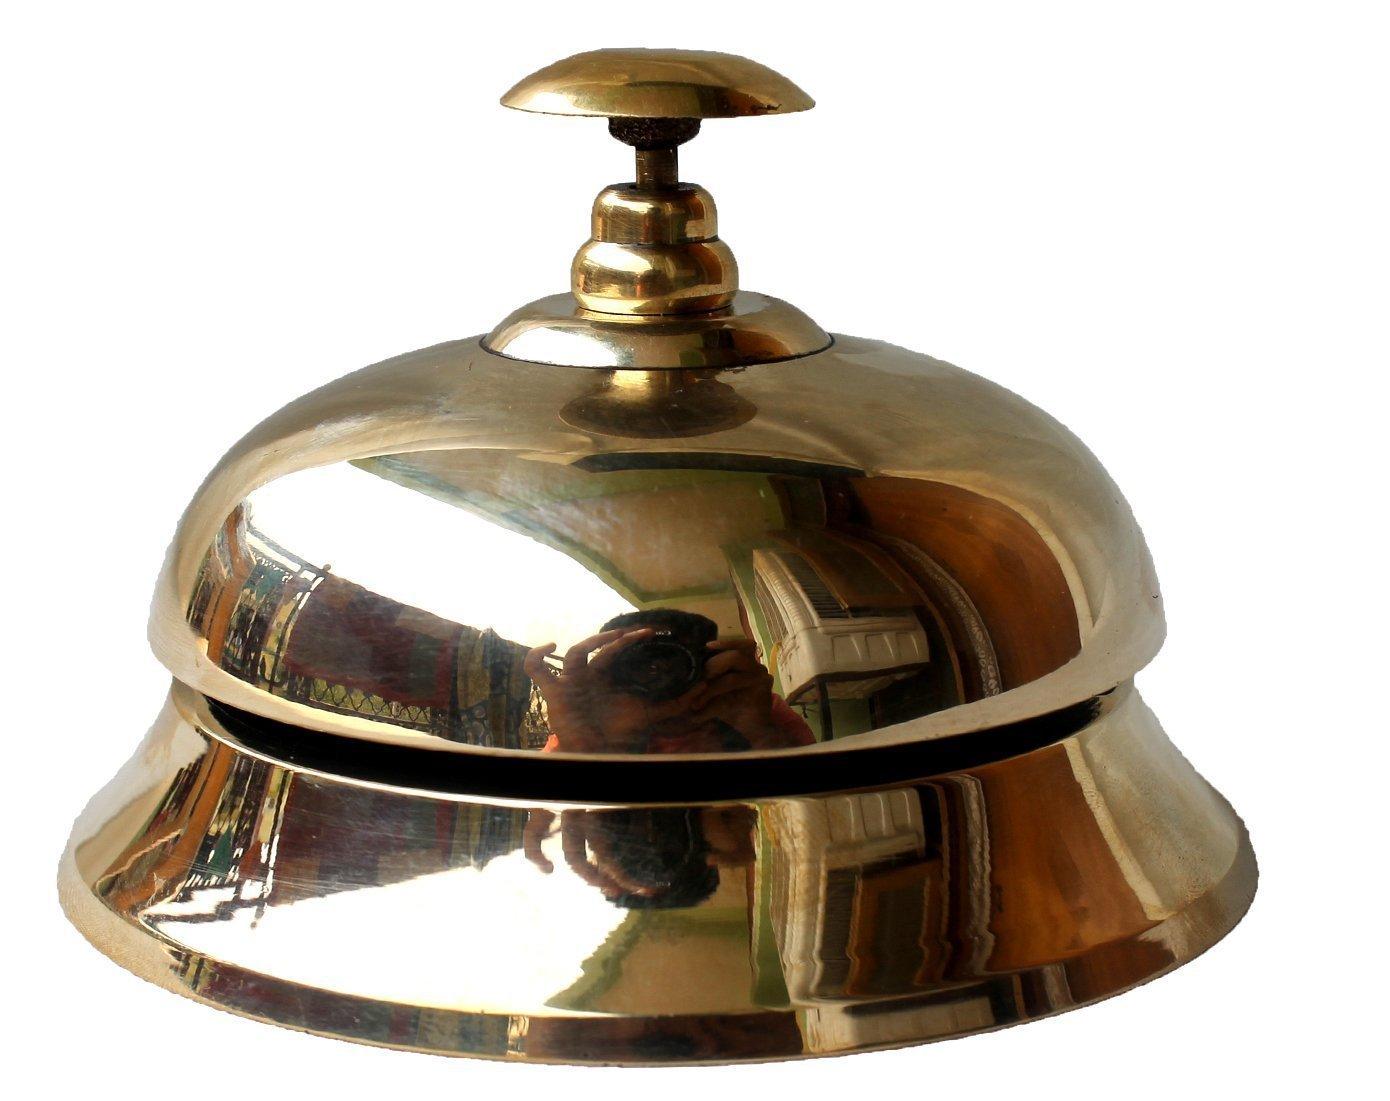 PARIJAT HANDICRAFT Handcrafted Solid Brass Hotel Counter Bell, Officer call bell Ornate Brass Hotel Counter Bell Desk Bell Service Bell for Hotels, Schools, Restaurants, Reception Areas, Hospitals.